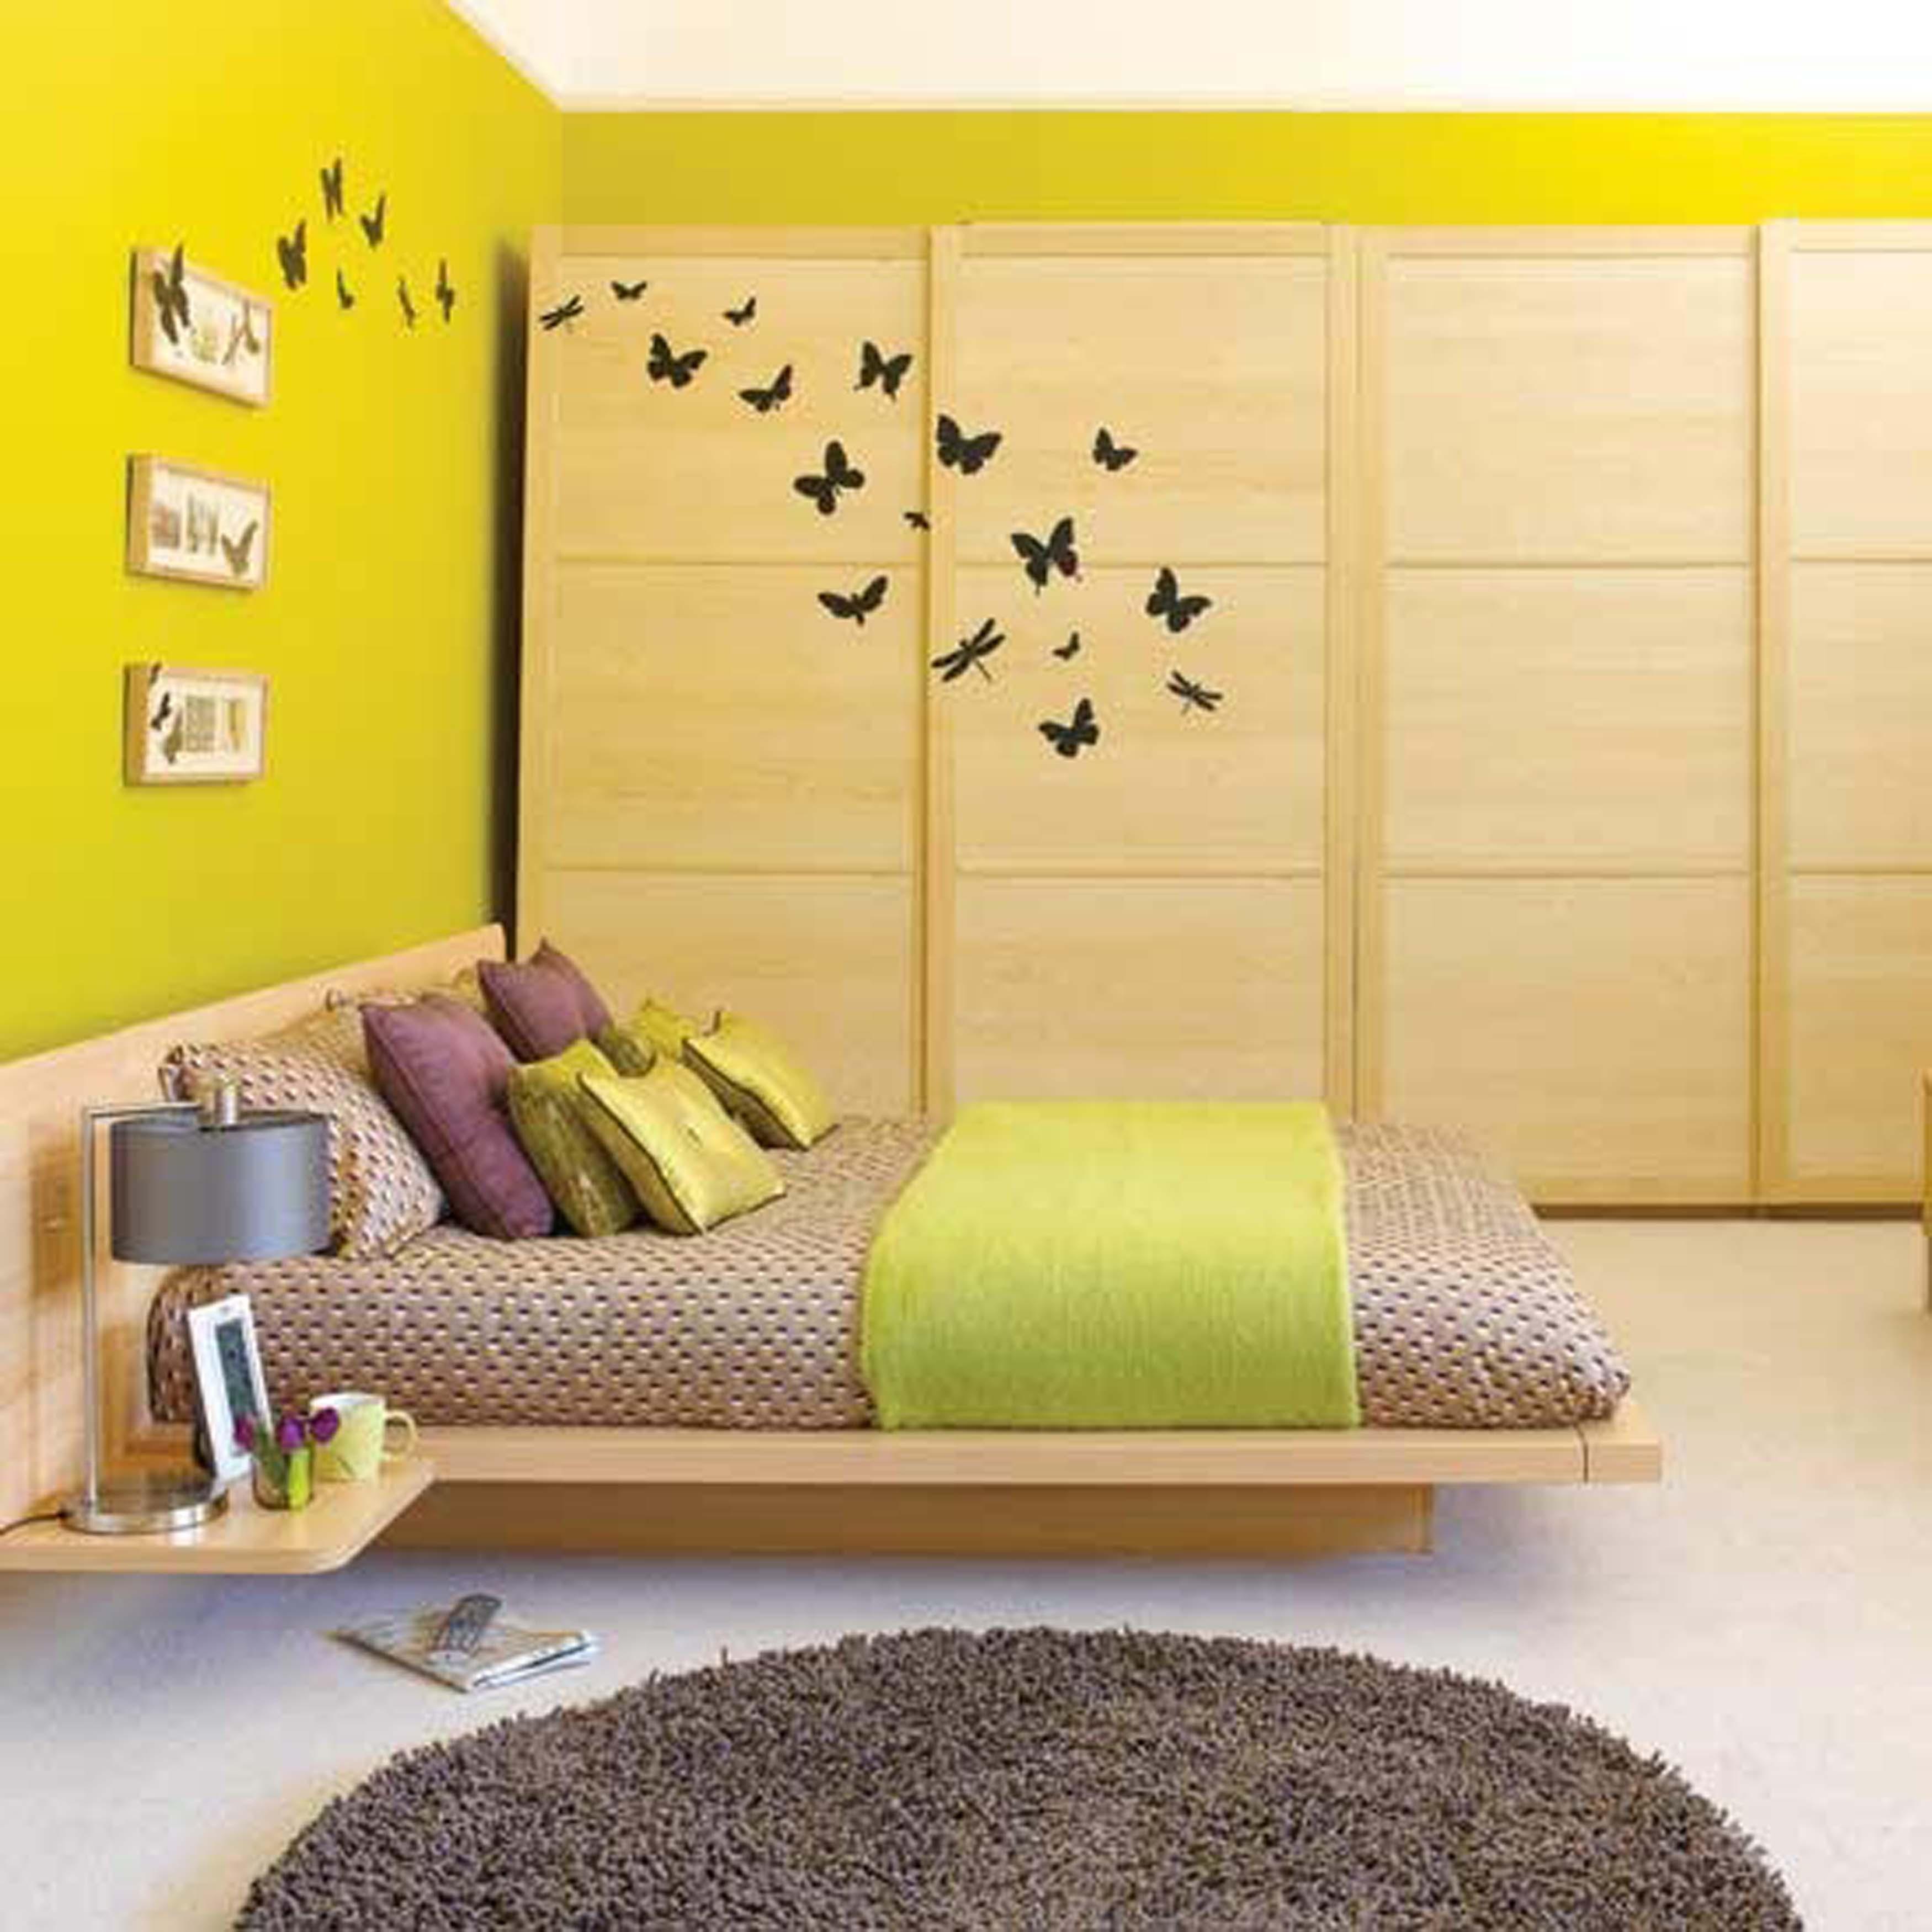 تصاميم غرف نوم مودرن مميزة | المرسال